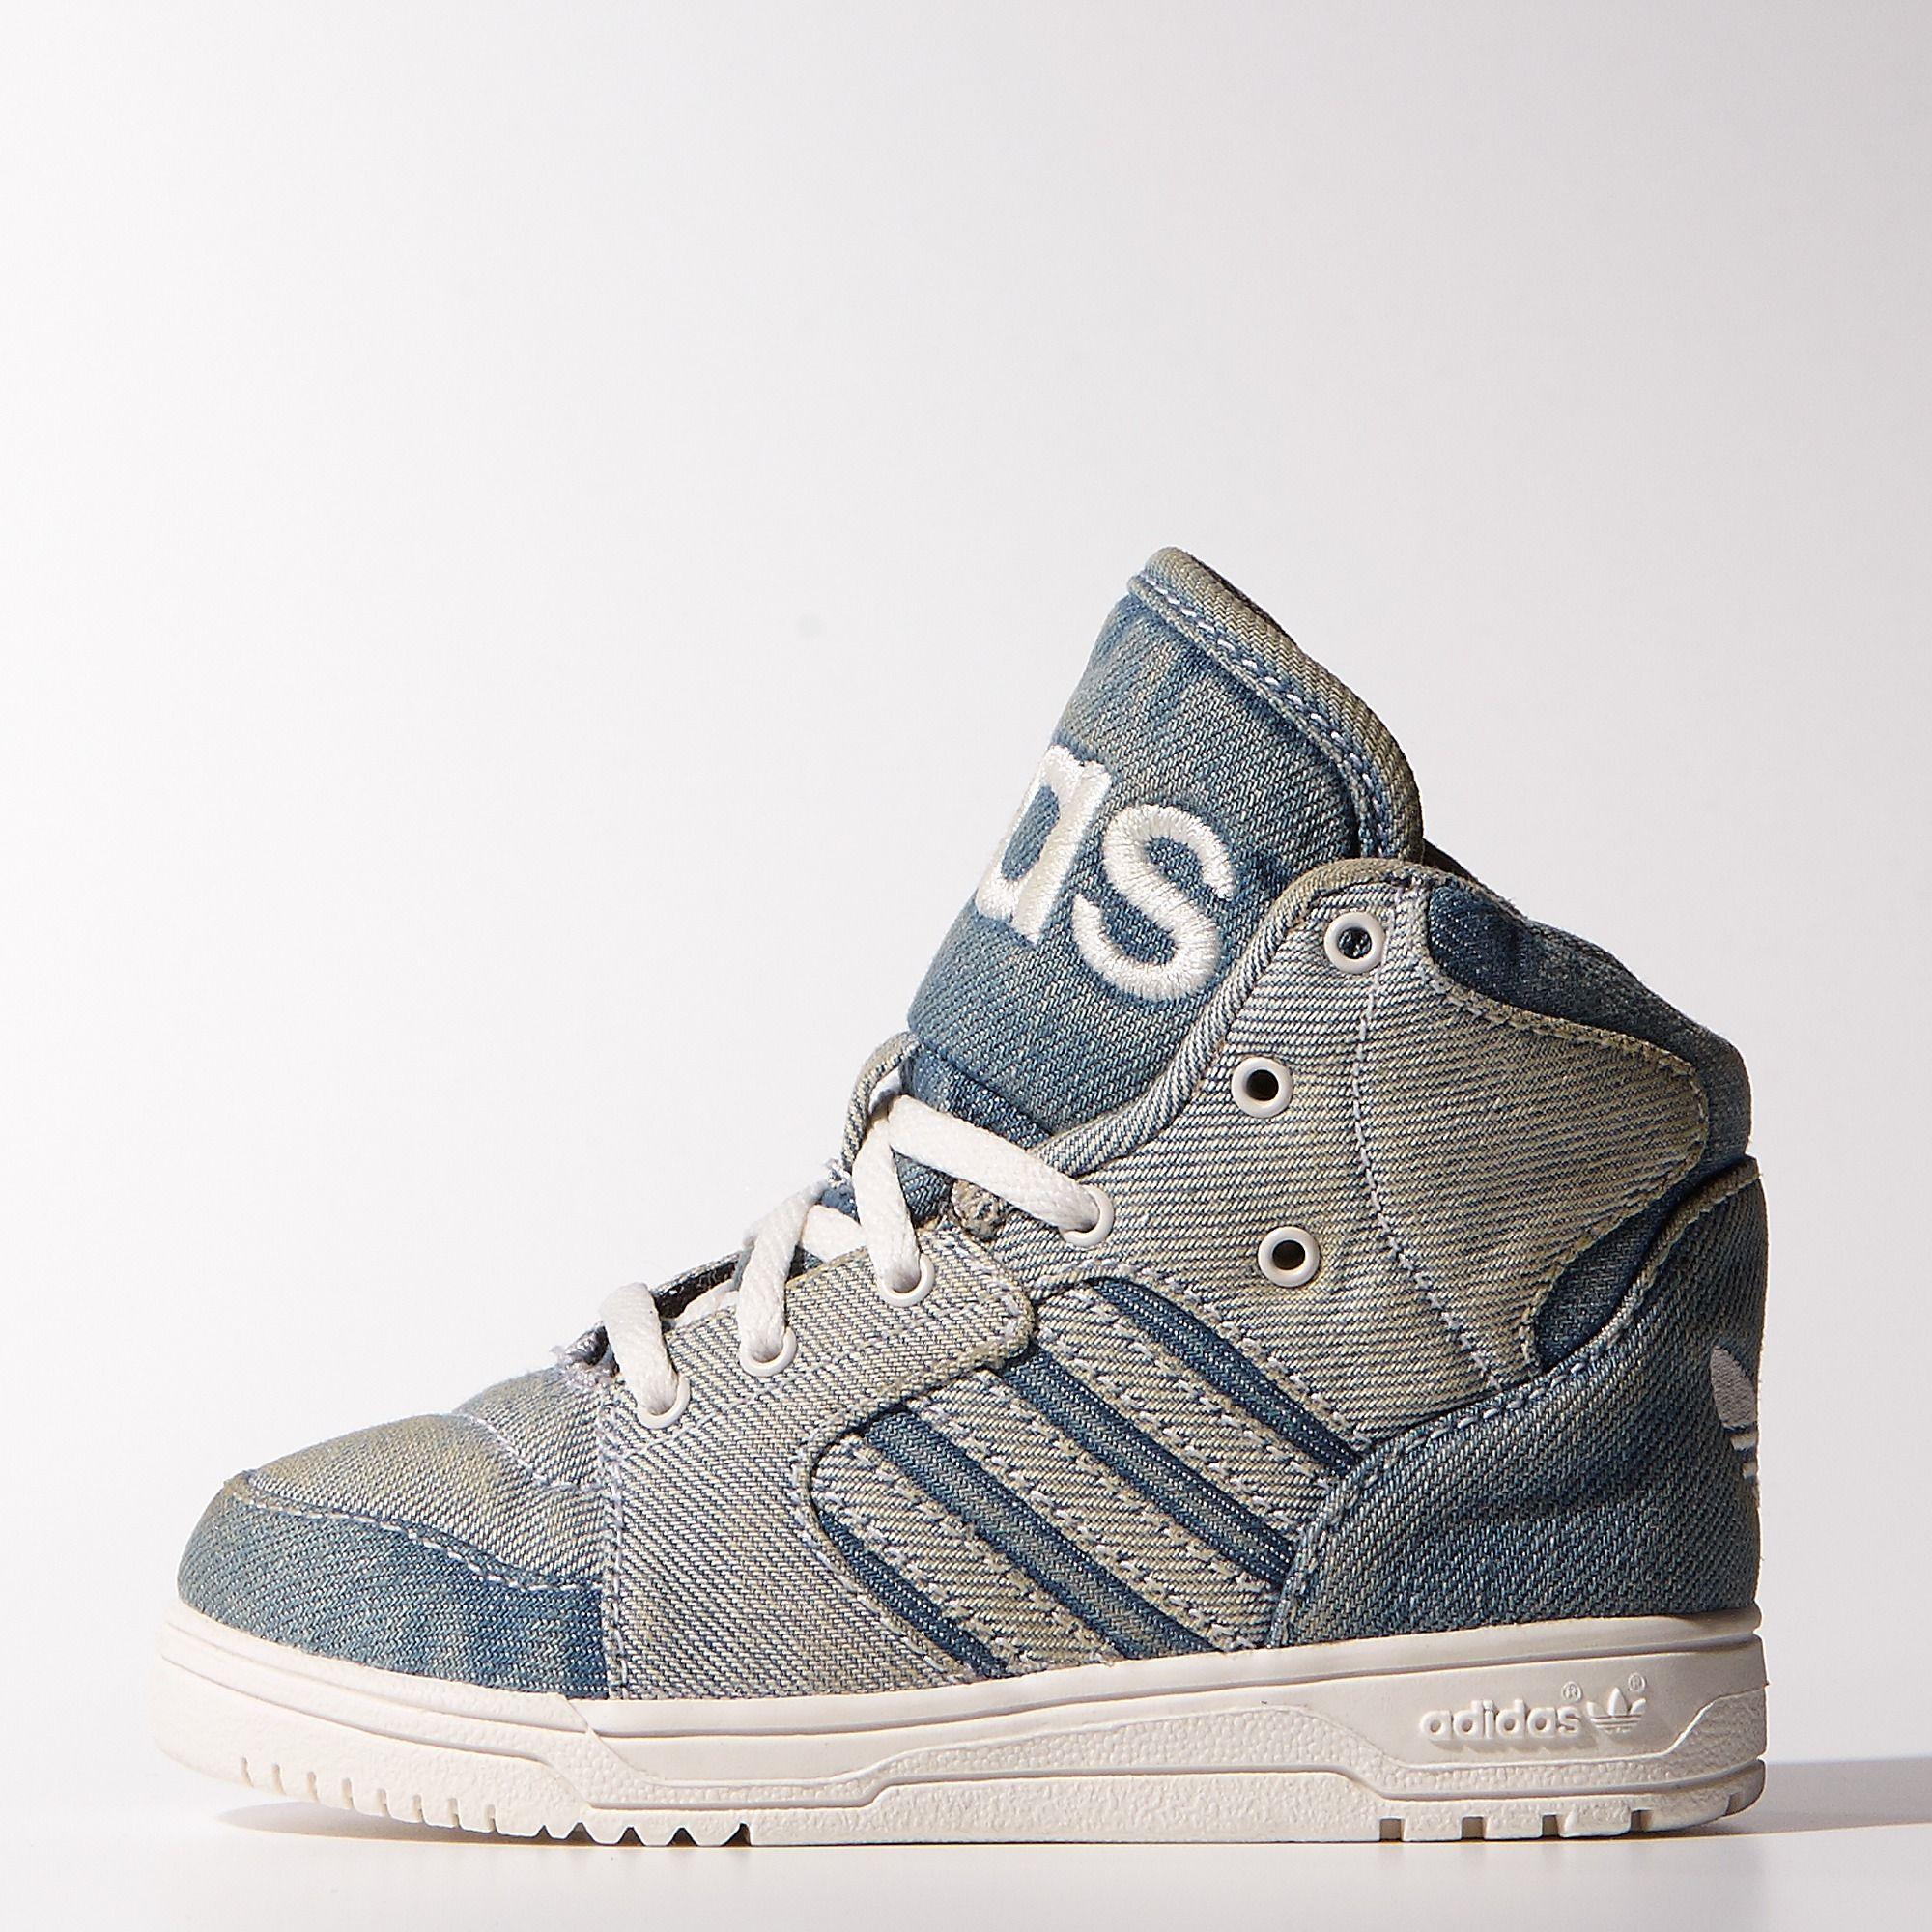 adidas WENEO Super Wedge Shoes | adidas UK in 2020 | Adidas